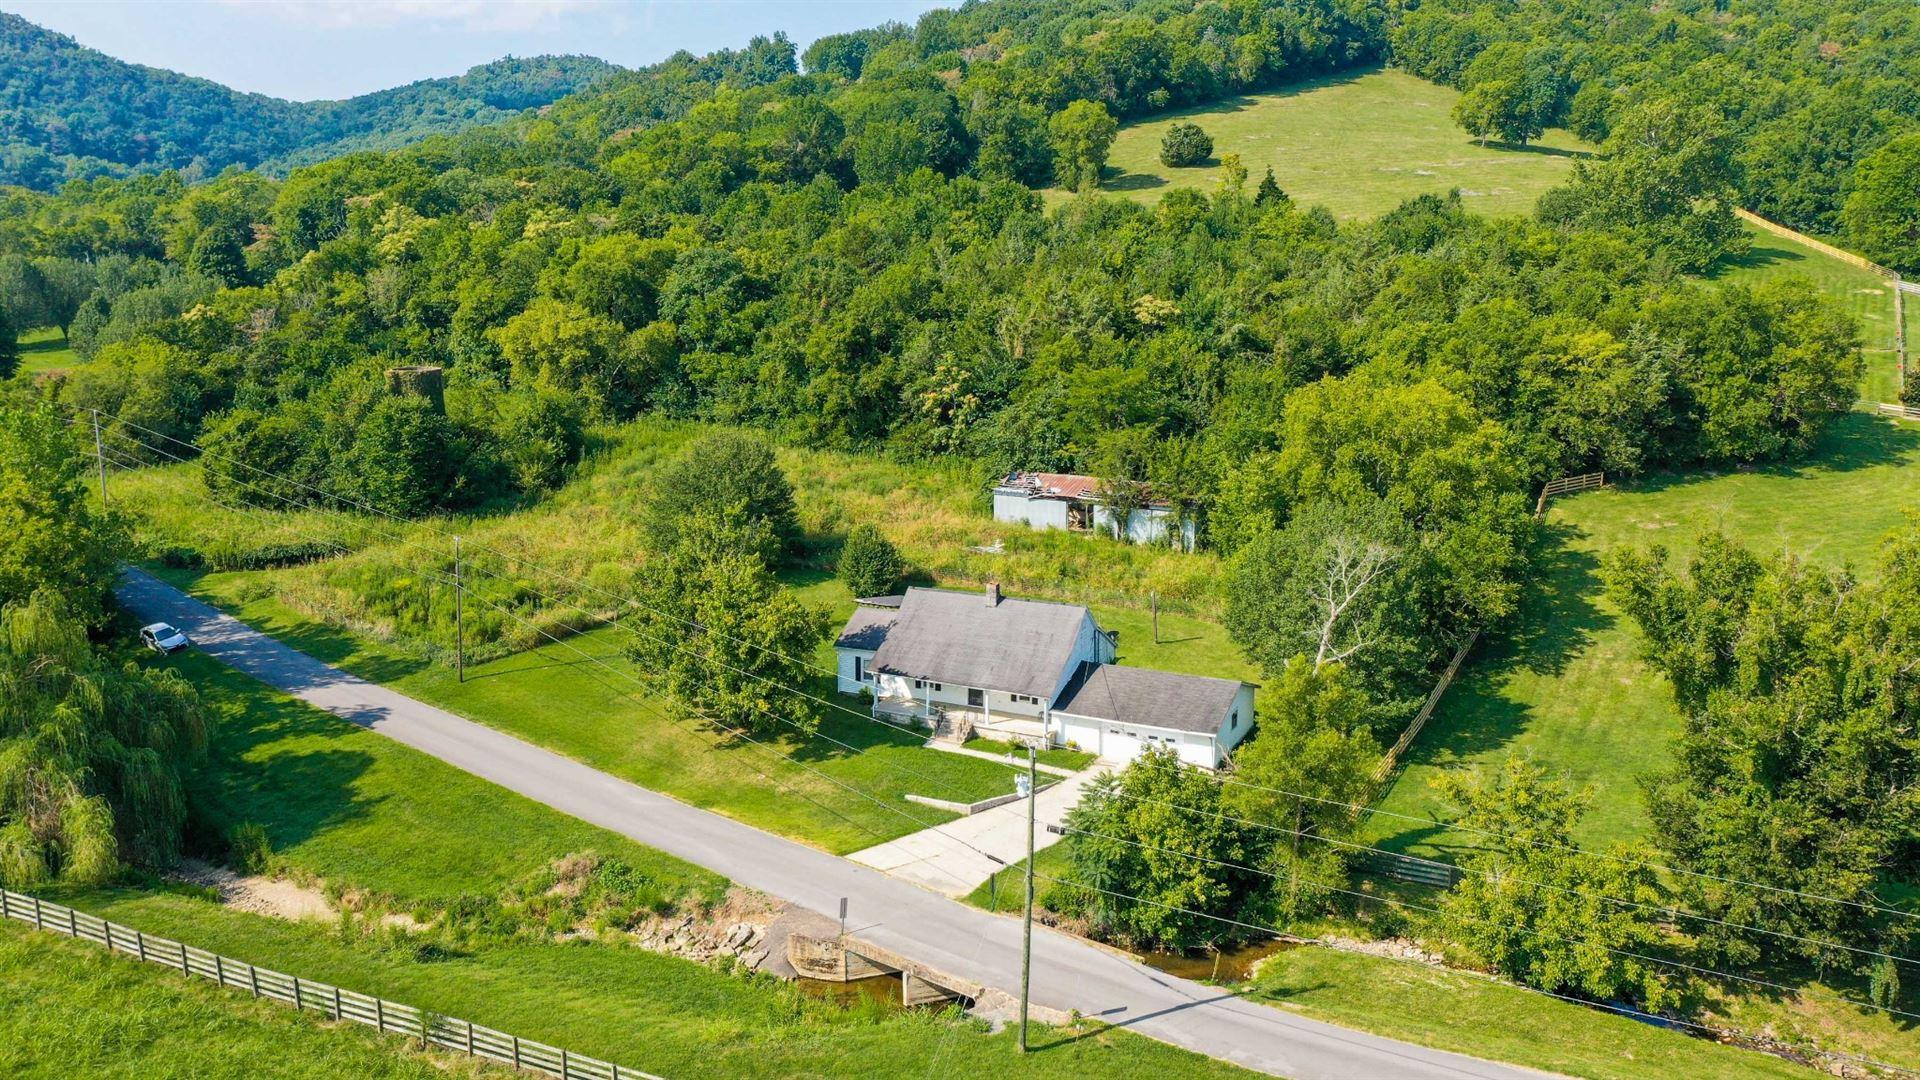 1010 Patton Hollow Rd, Watertown, TN 37184 - MLS#: 2281712